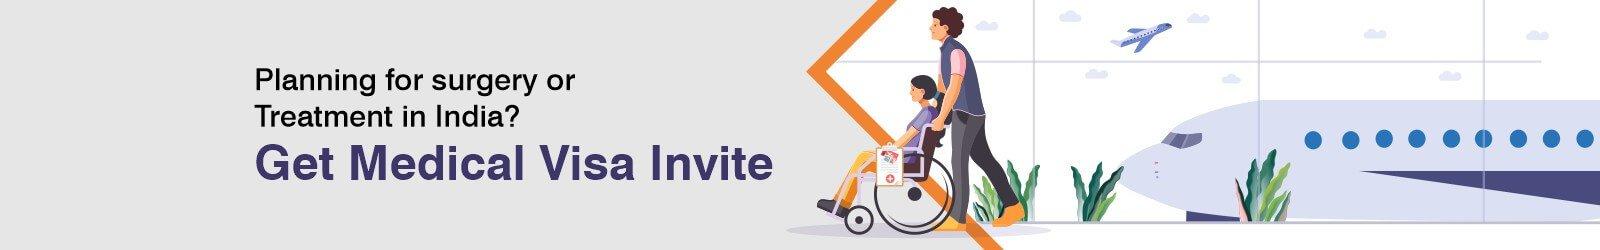 Get Medical Visa Invite from India